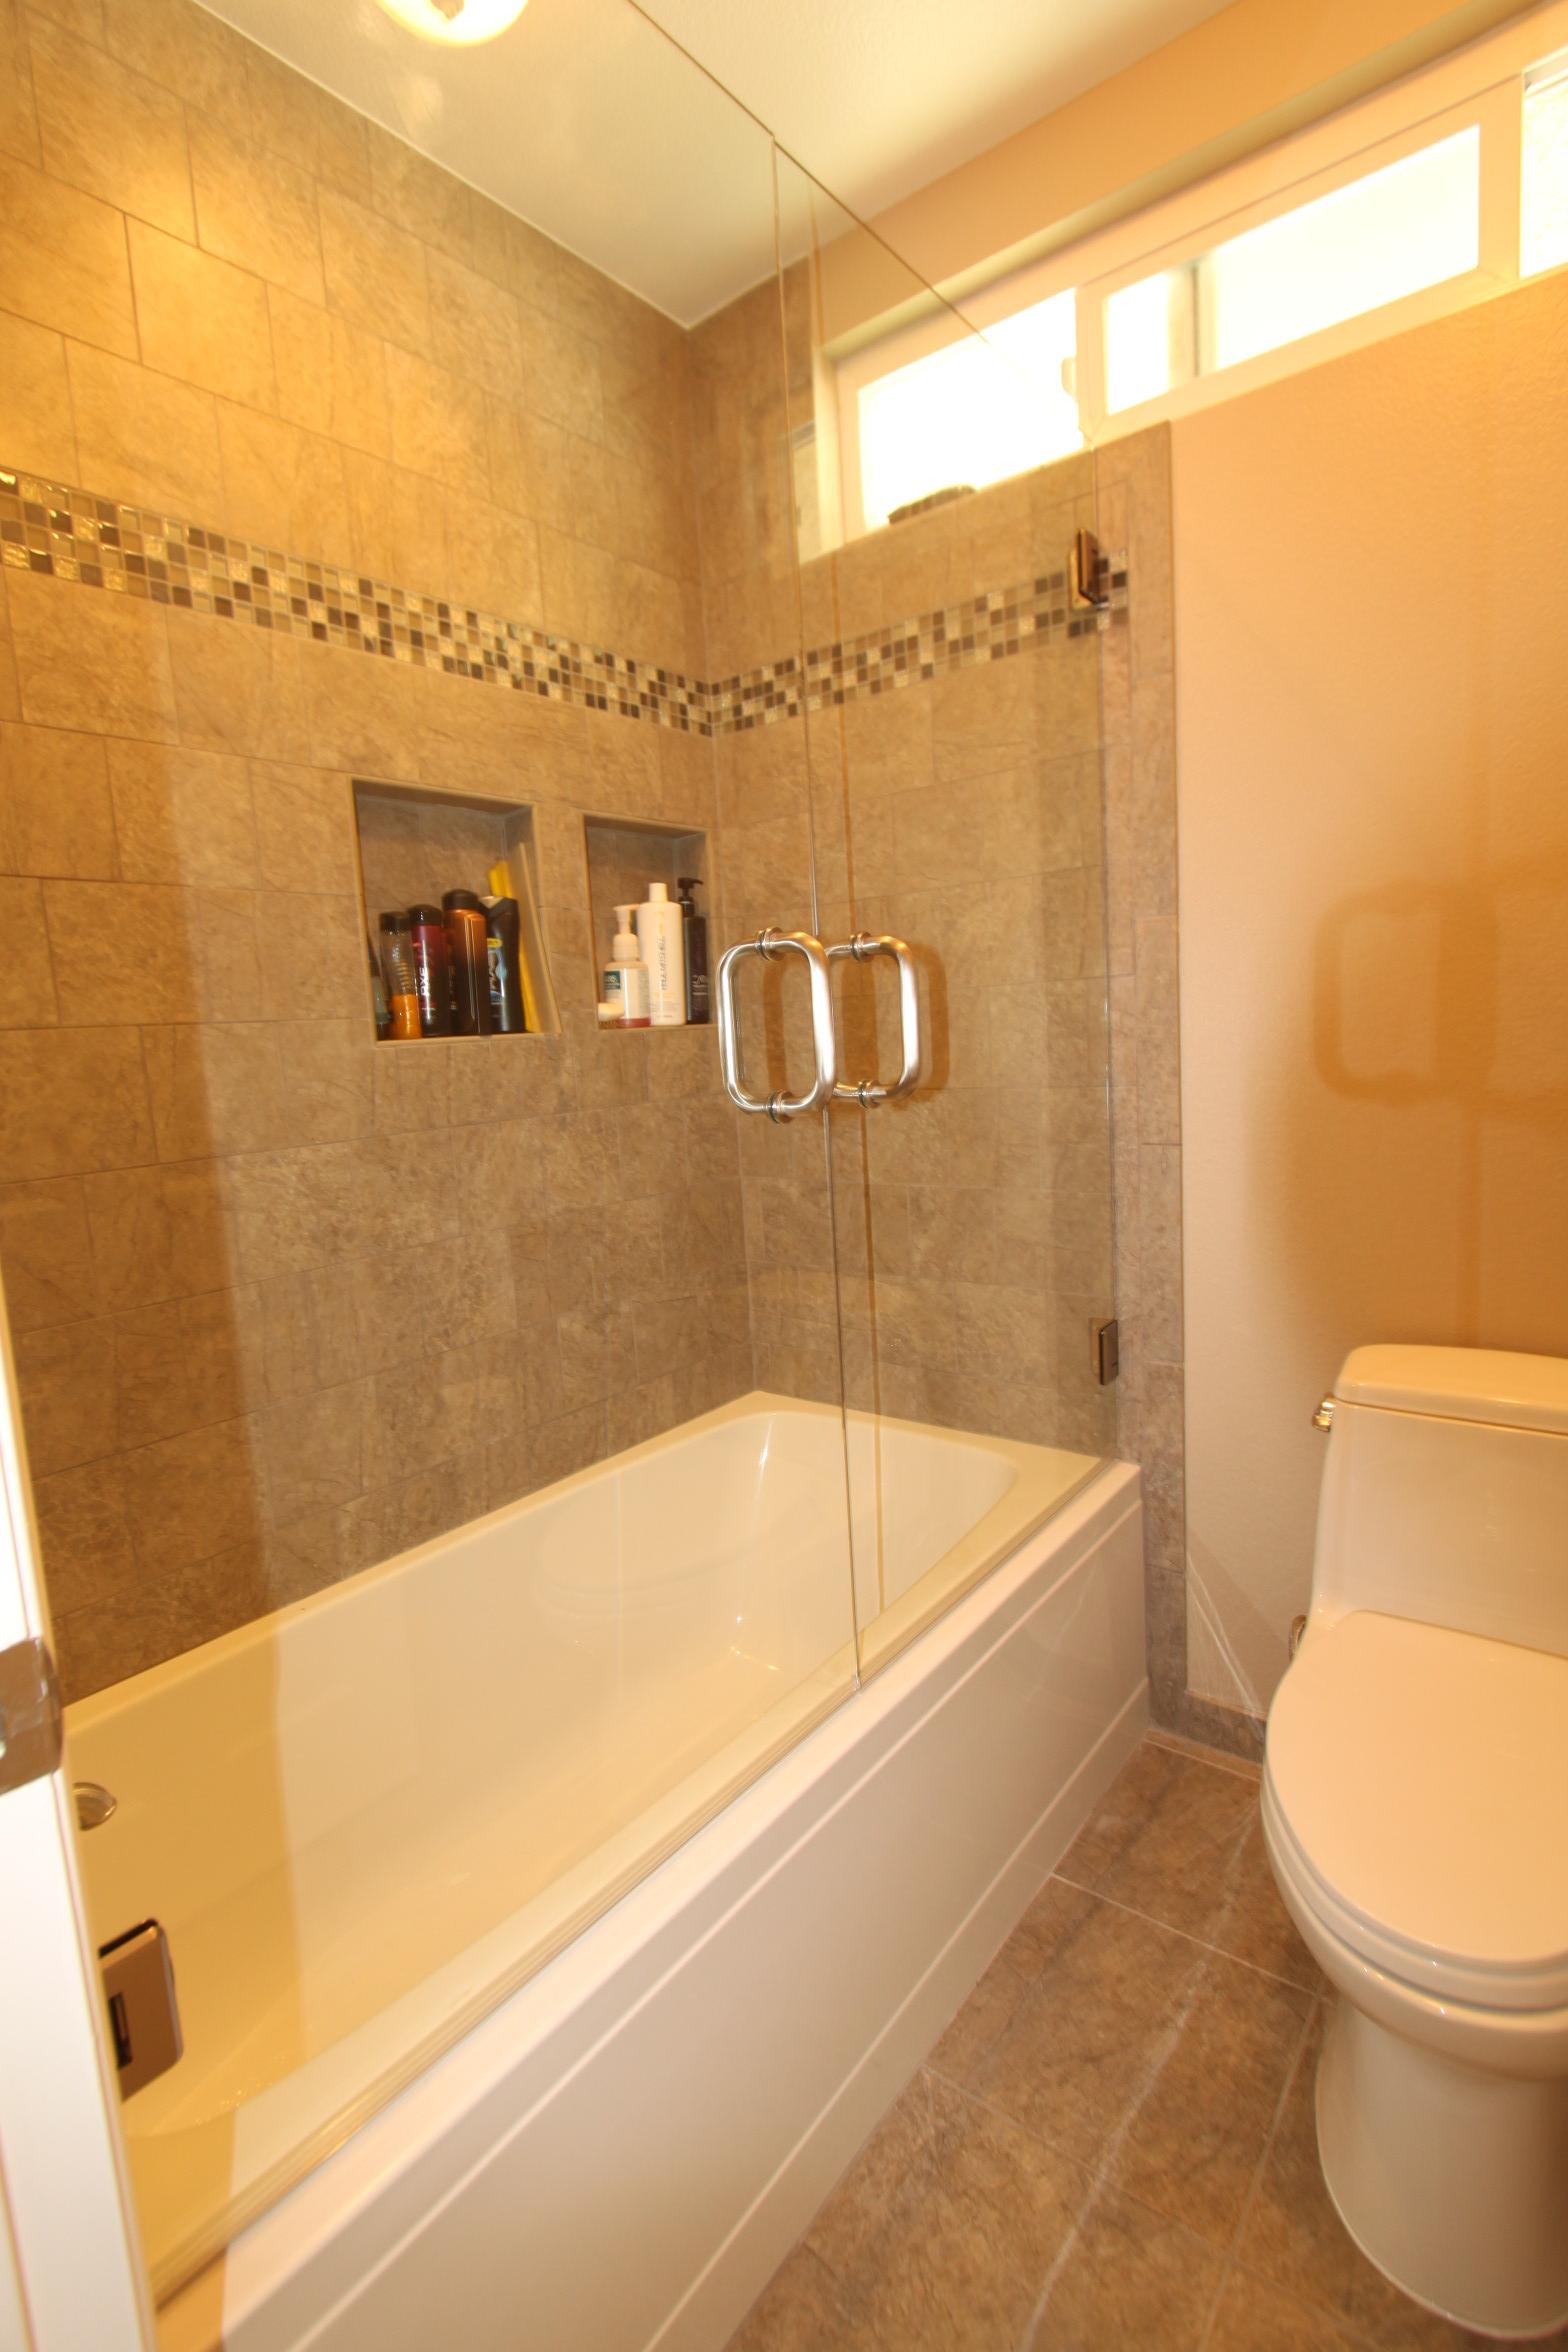 Bathtub Tile - Bathroom Tile   Westside Tile and Stone